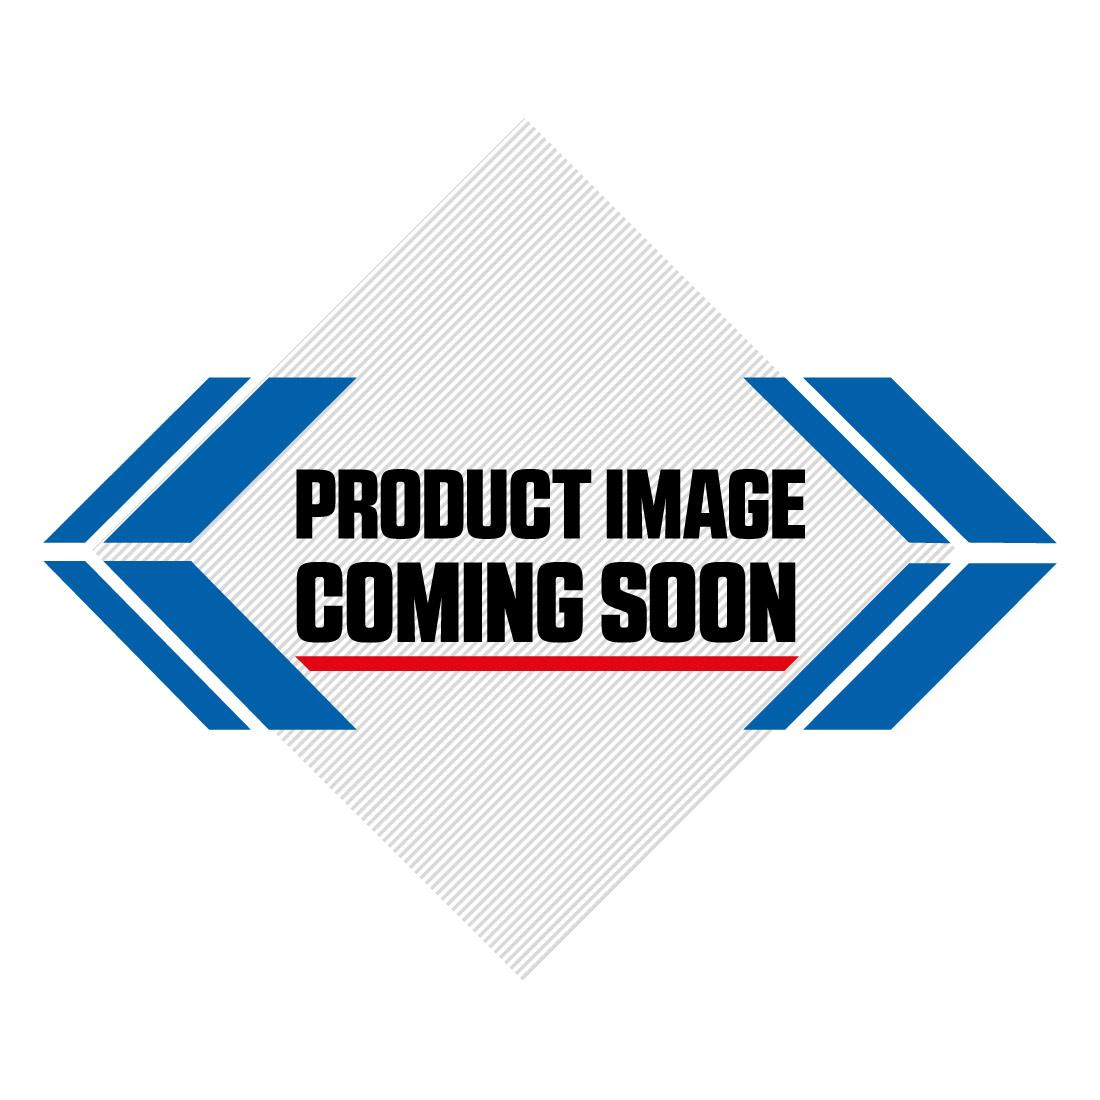 Honda Plastic Kit CRF 250 (14-17) CRF 450 (13-16) OEM Factory Image-0